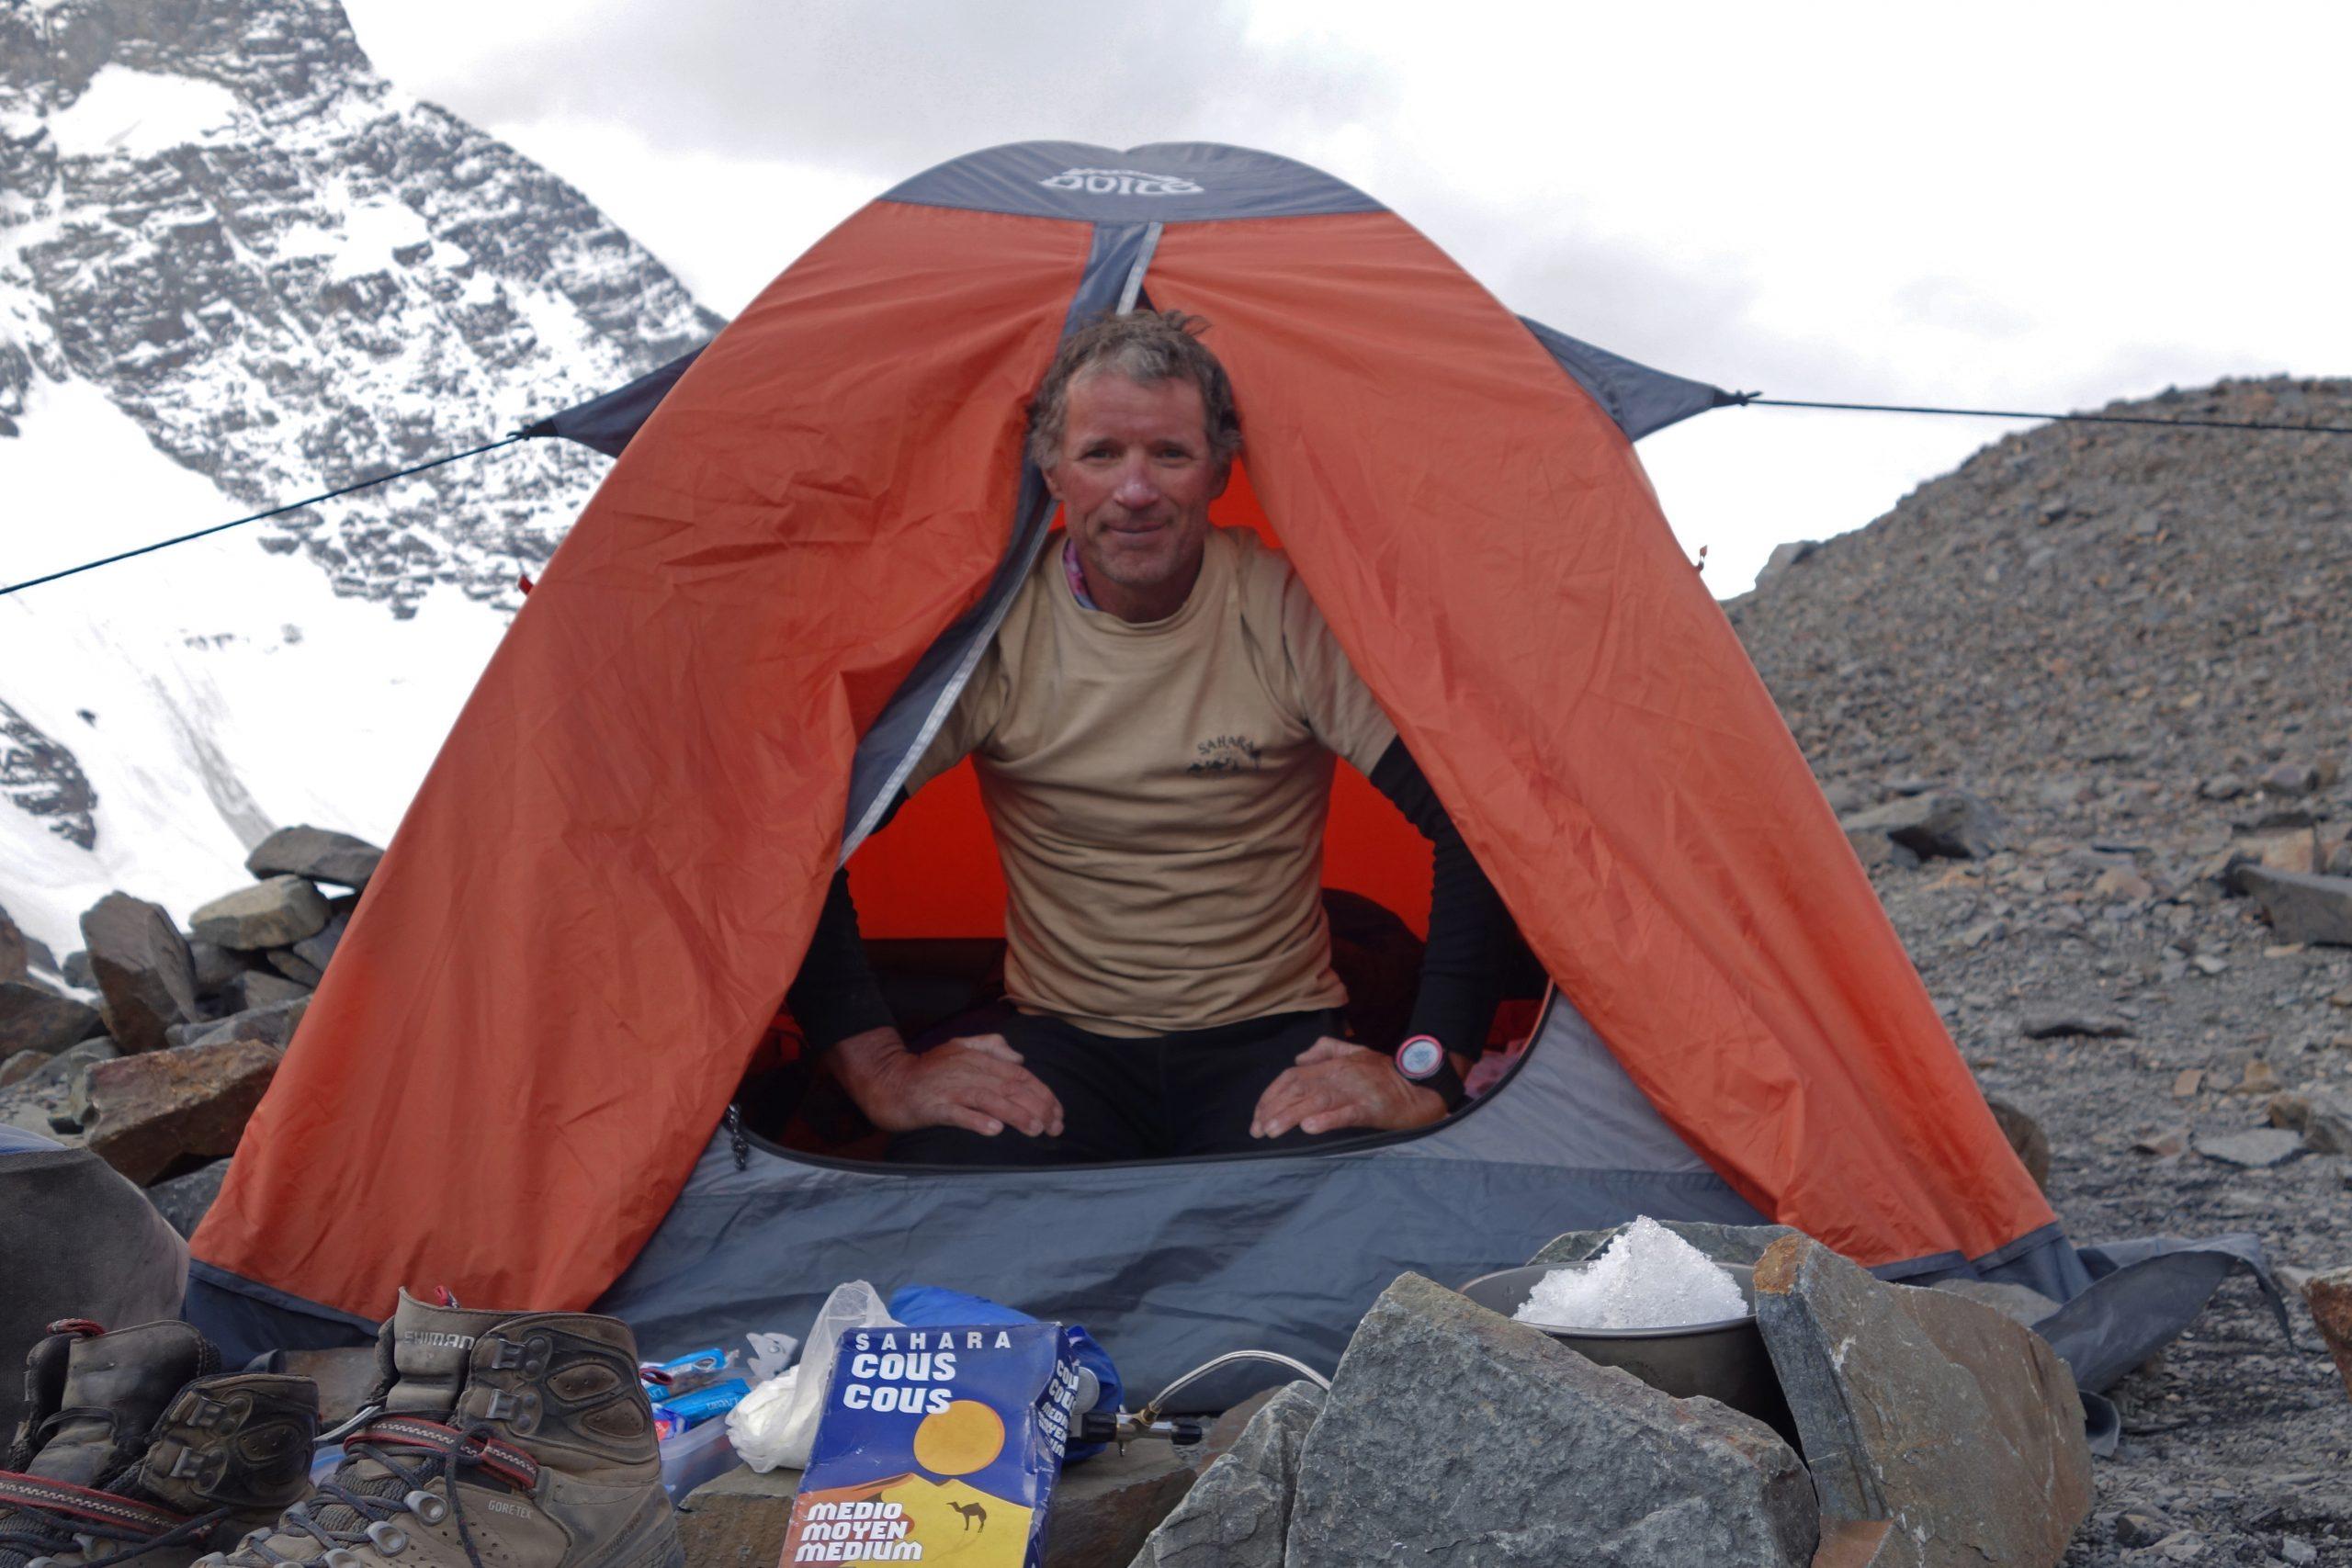 Radreise Südamerika 2019 - Camp Hoyada (4.600m)